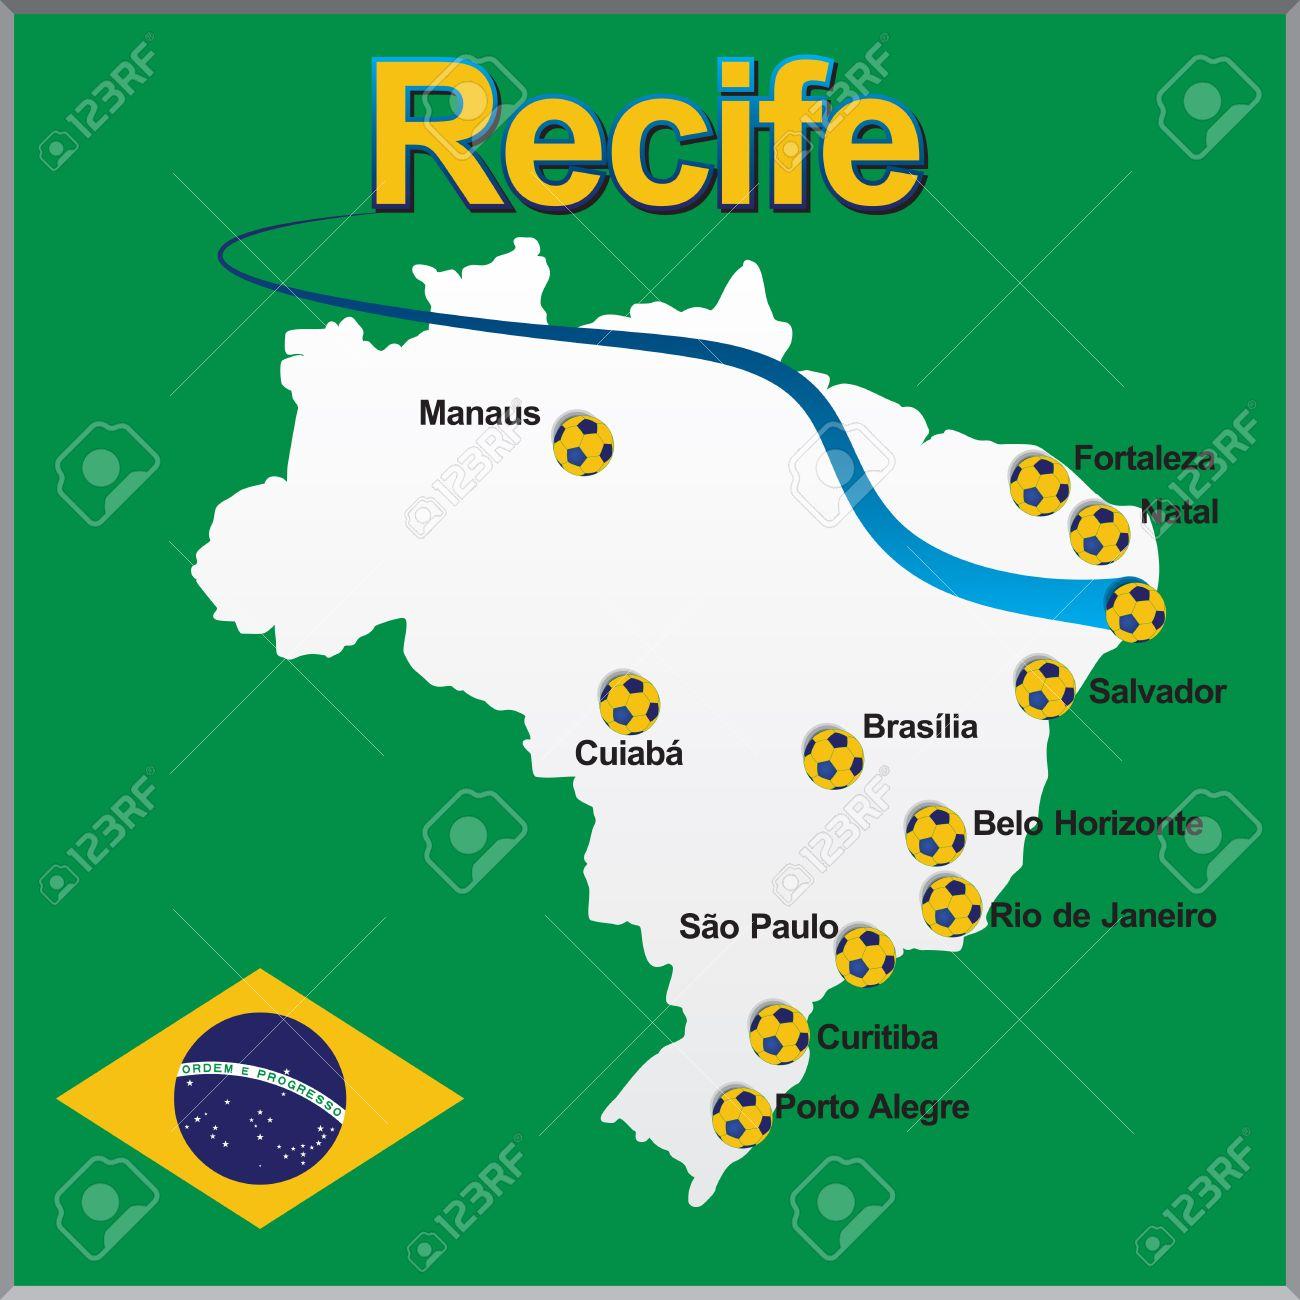 Recife Brazil Map Recife   Brazil Map Soccer Ball Royalty Free Cliparts, Vectors  Recife Brazil Map